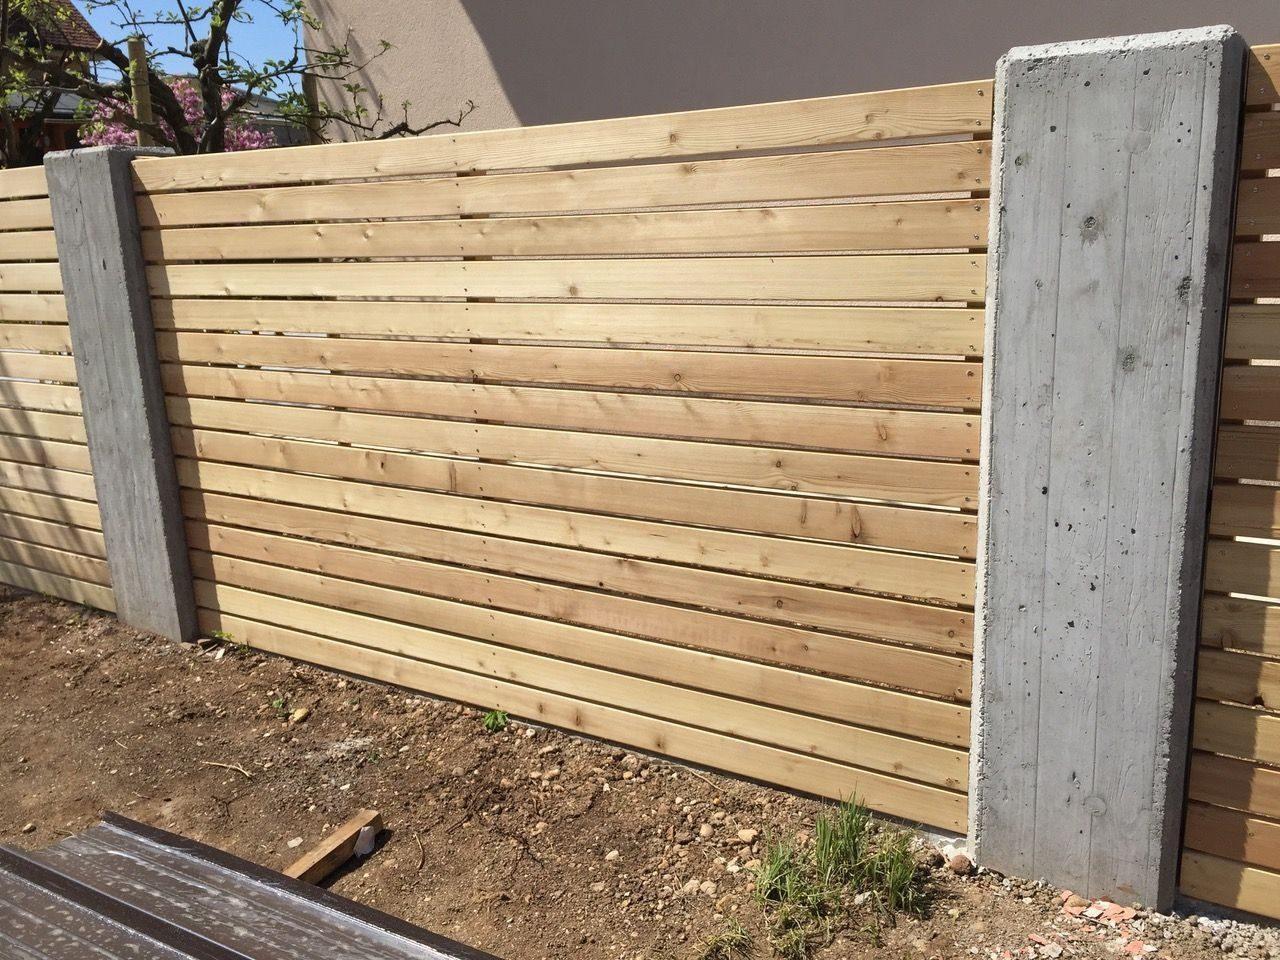 sibirski-macesen-lesene-terase-lesene-fasade-pd-les.si-113